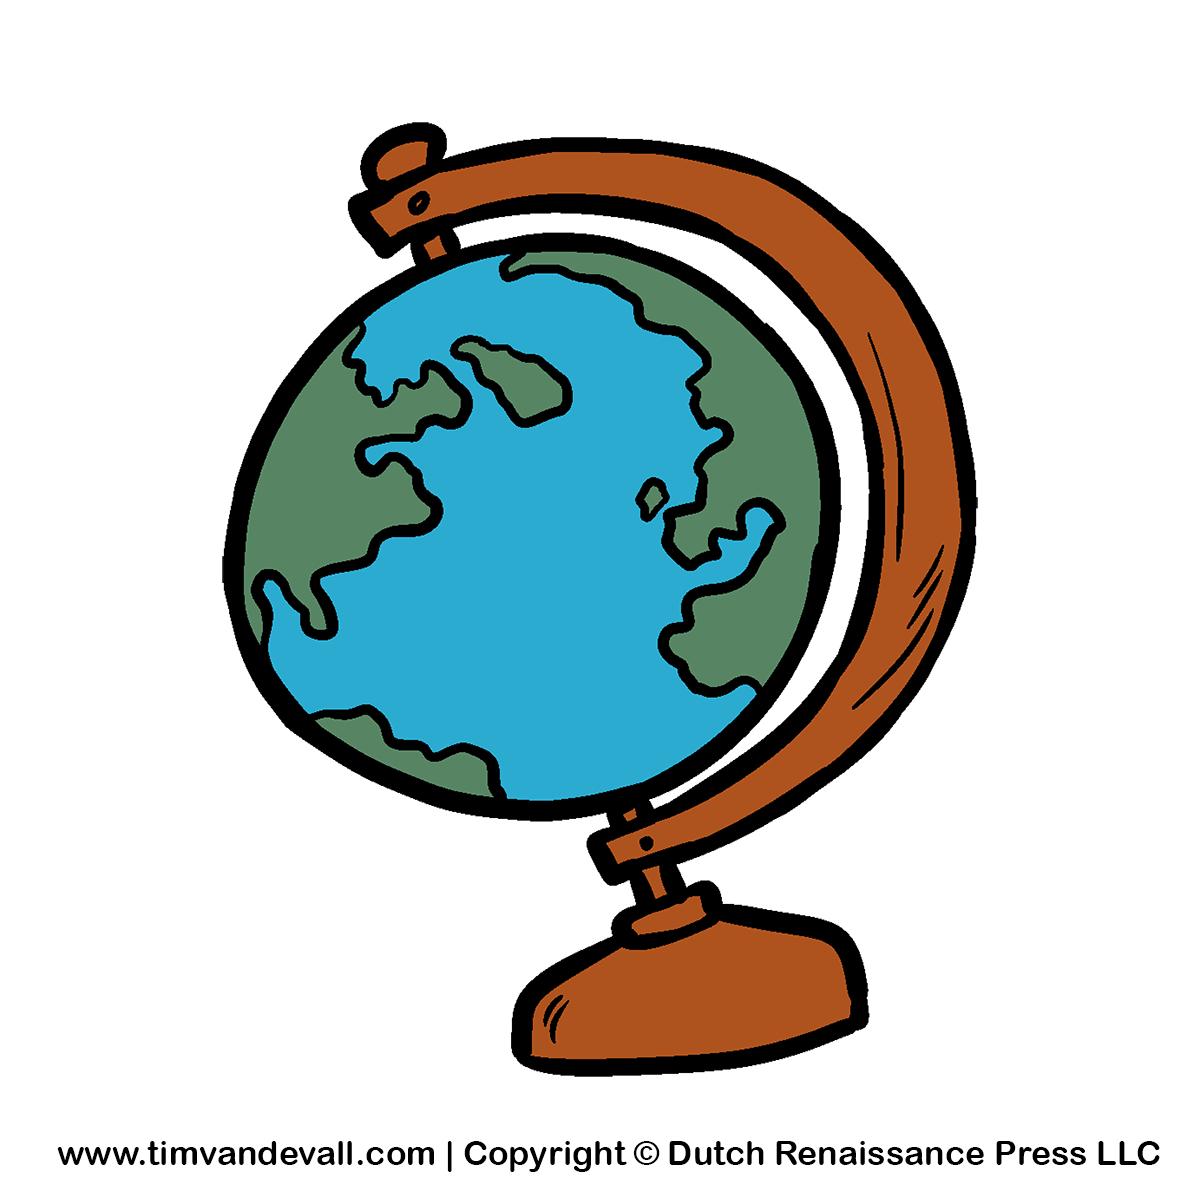 Cartoon Globe Clipart For Kids Social St-Cartoon Globe Clipart For Kids Social Studies Georgraphy Clipart-2